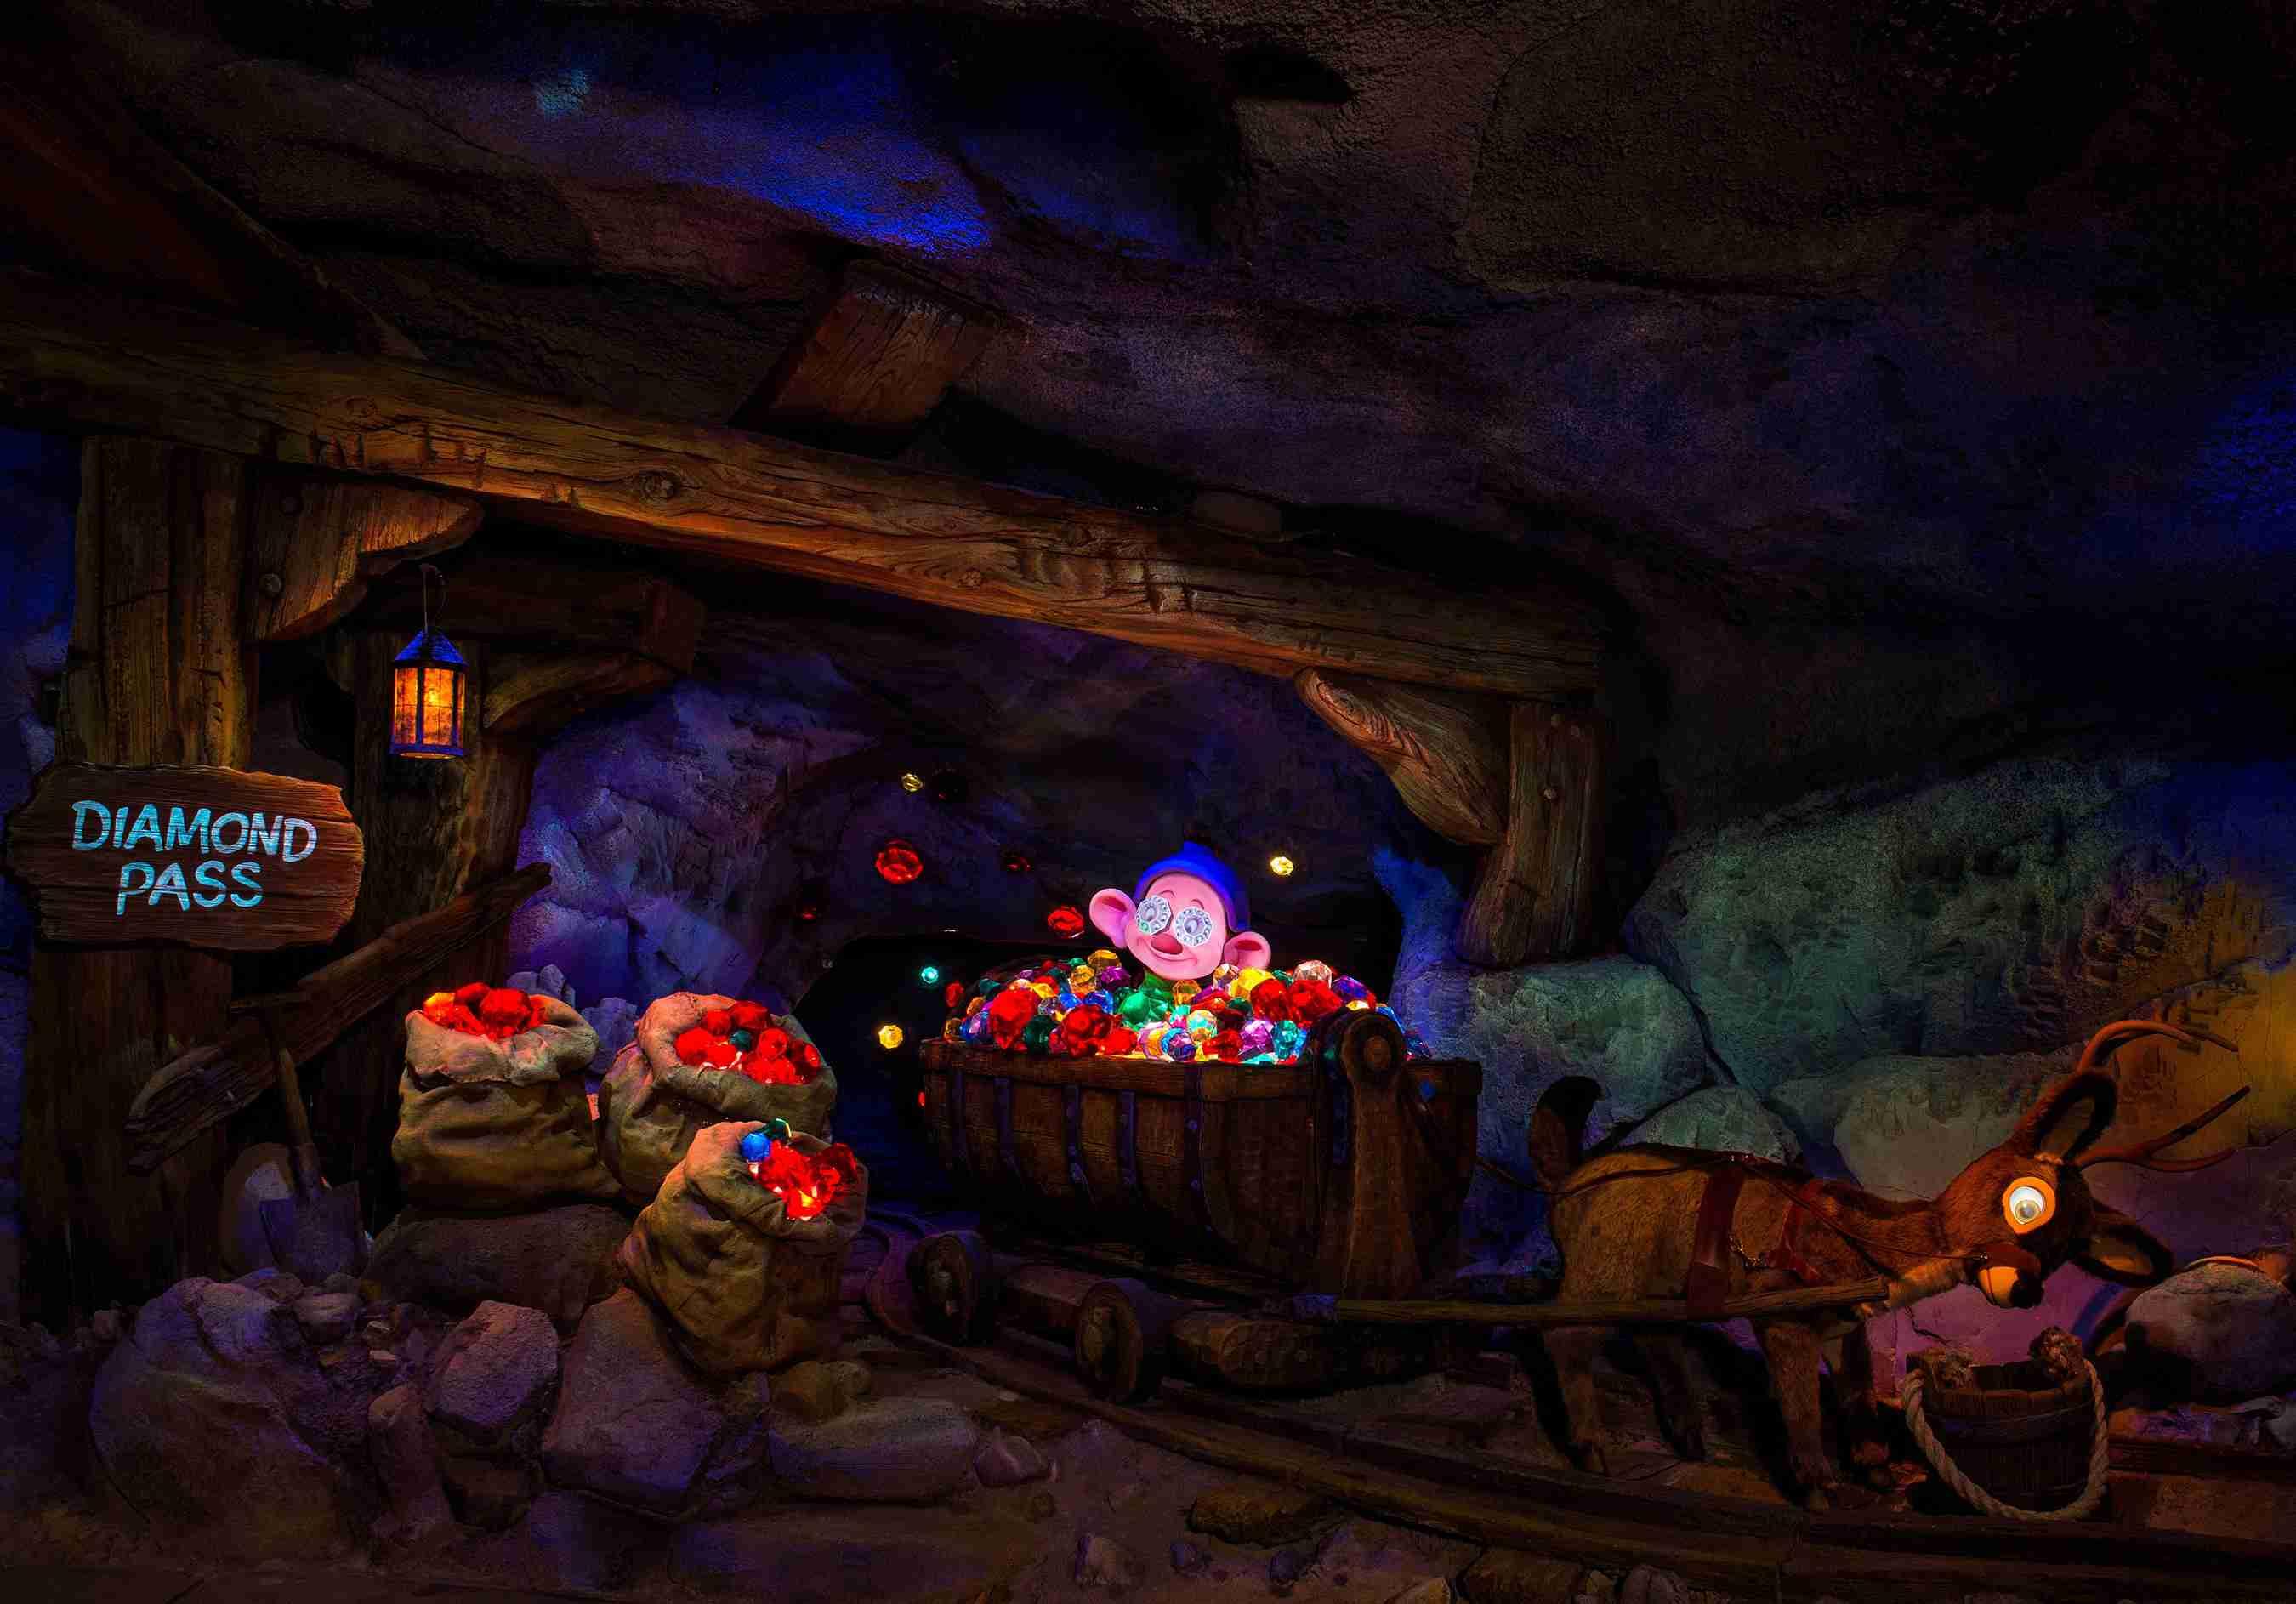 Seven Dwarfs Mine Train Disney World show scene